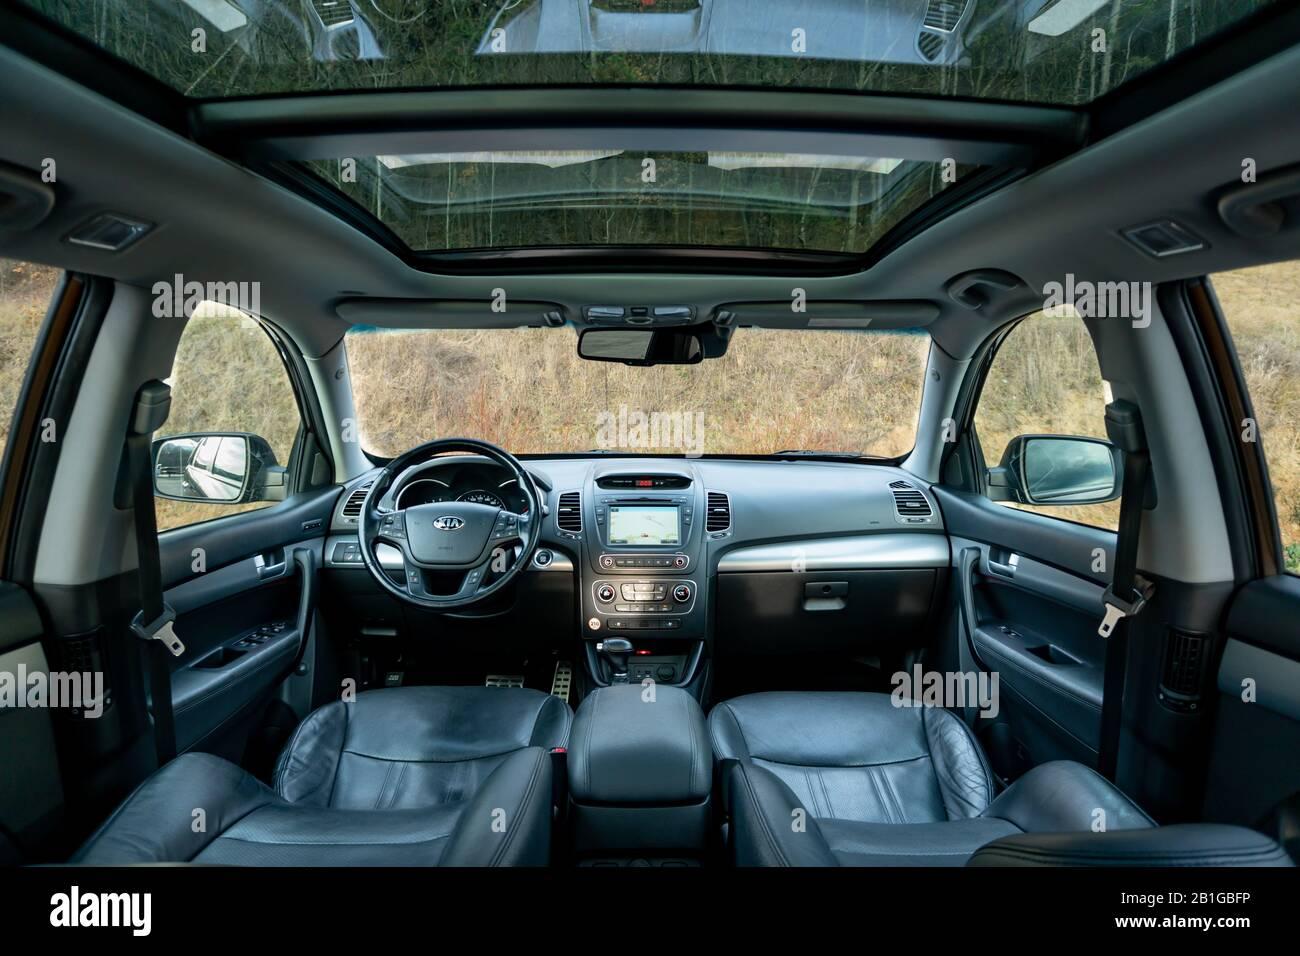 Inside detailed photo of wonderful SUV with panoramic glazed dach/sunroof - Kia Sorento Facelift Platinum Stock Photo